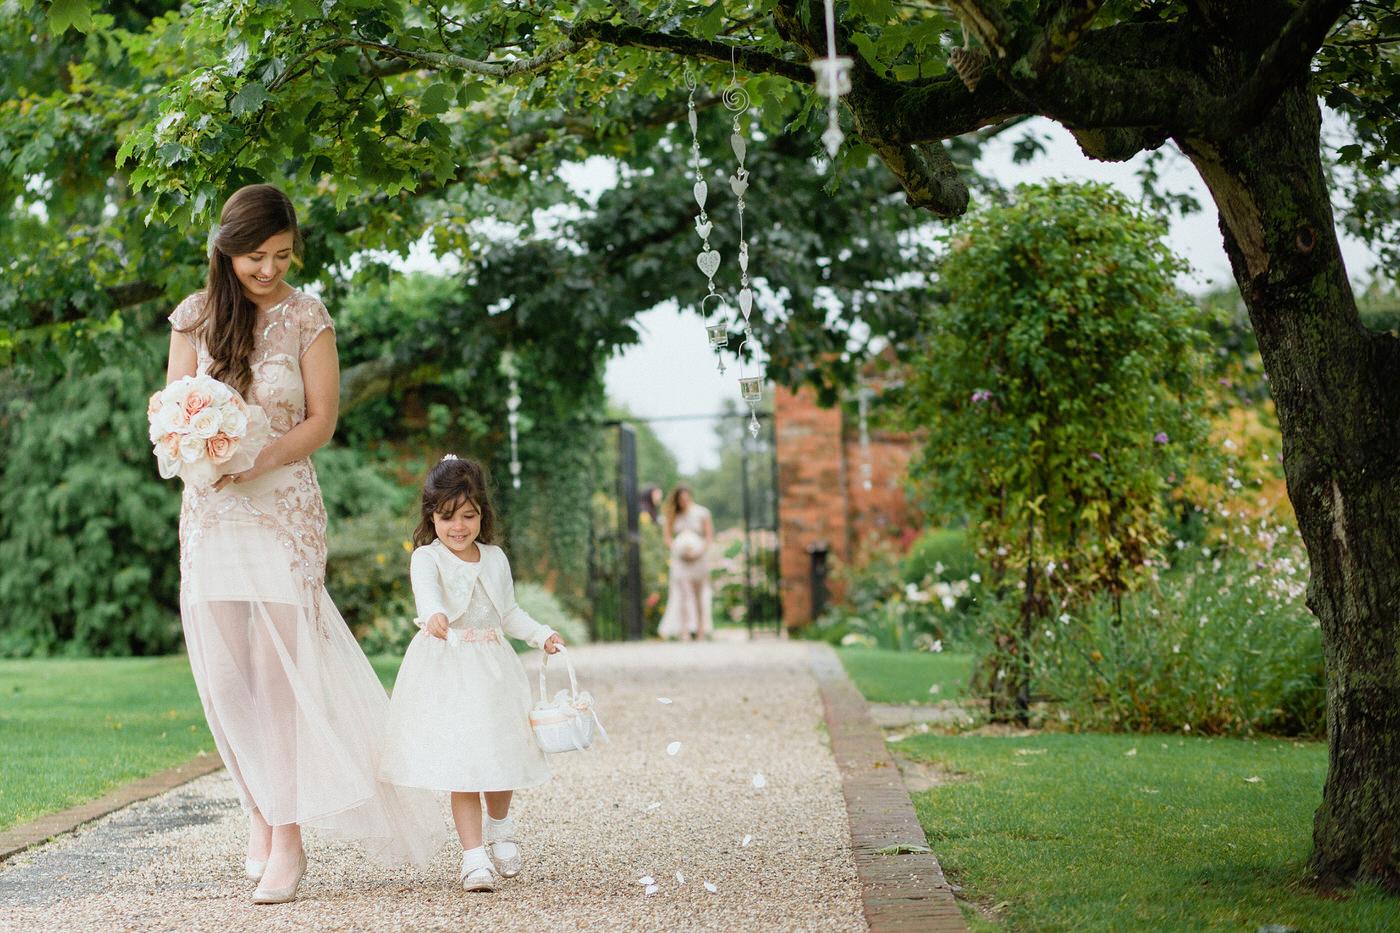 gaynes-park-wedding-photography-10.JPG